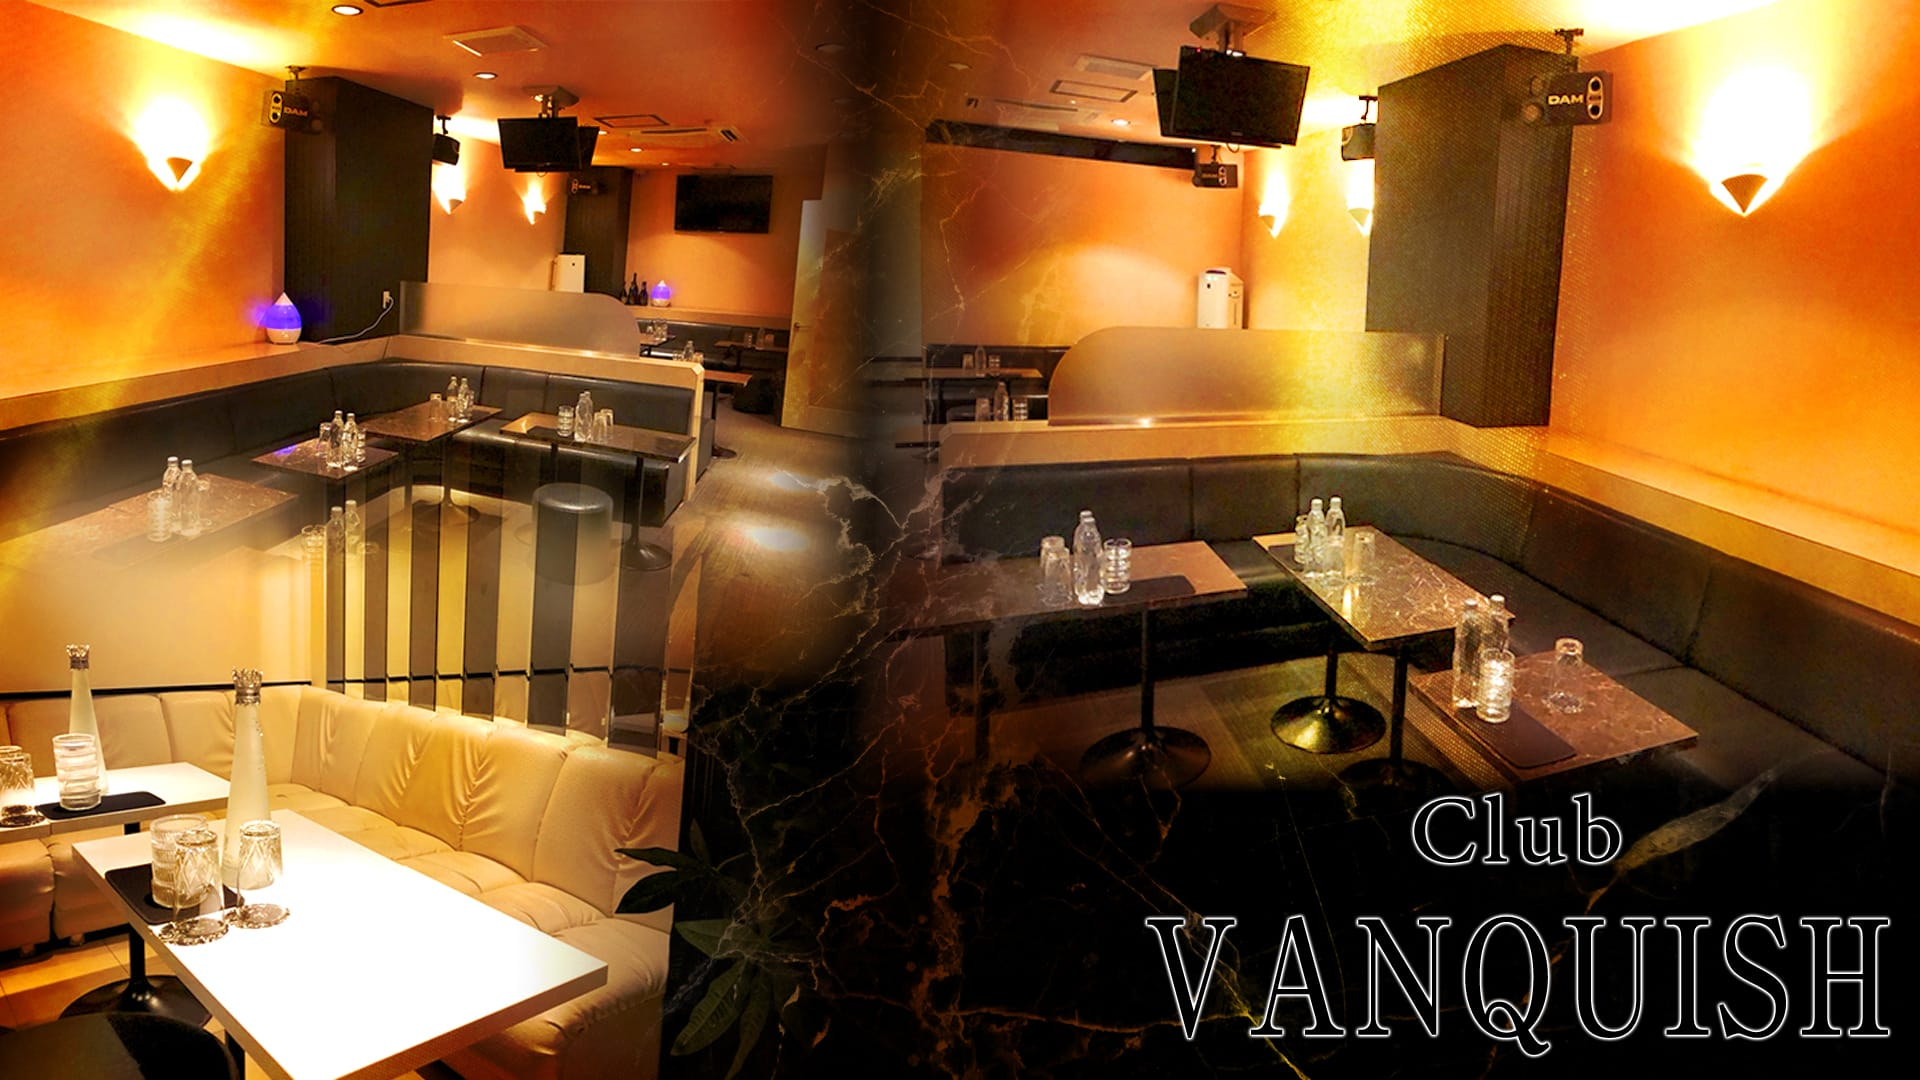 CLUB VANQUISH(ヴァンキッシュ) 溝の口キャバクラ TOP画像